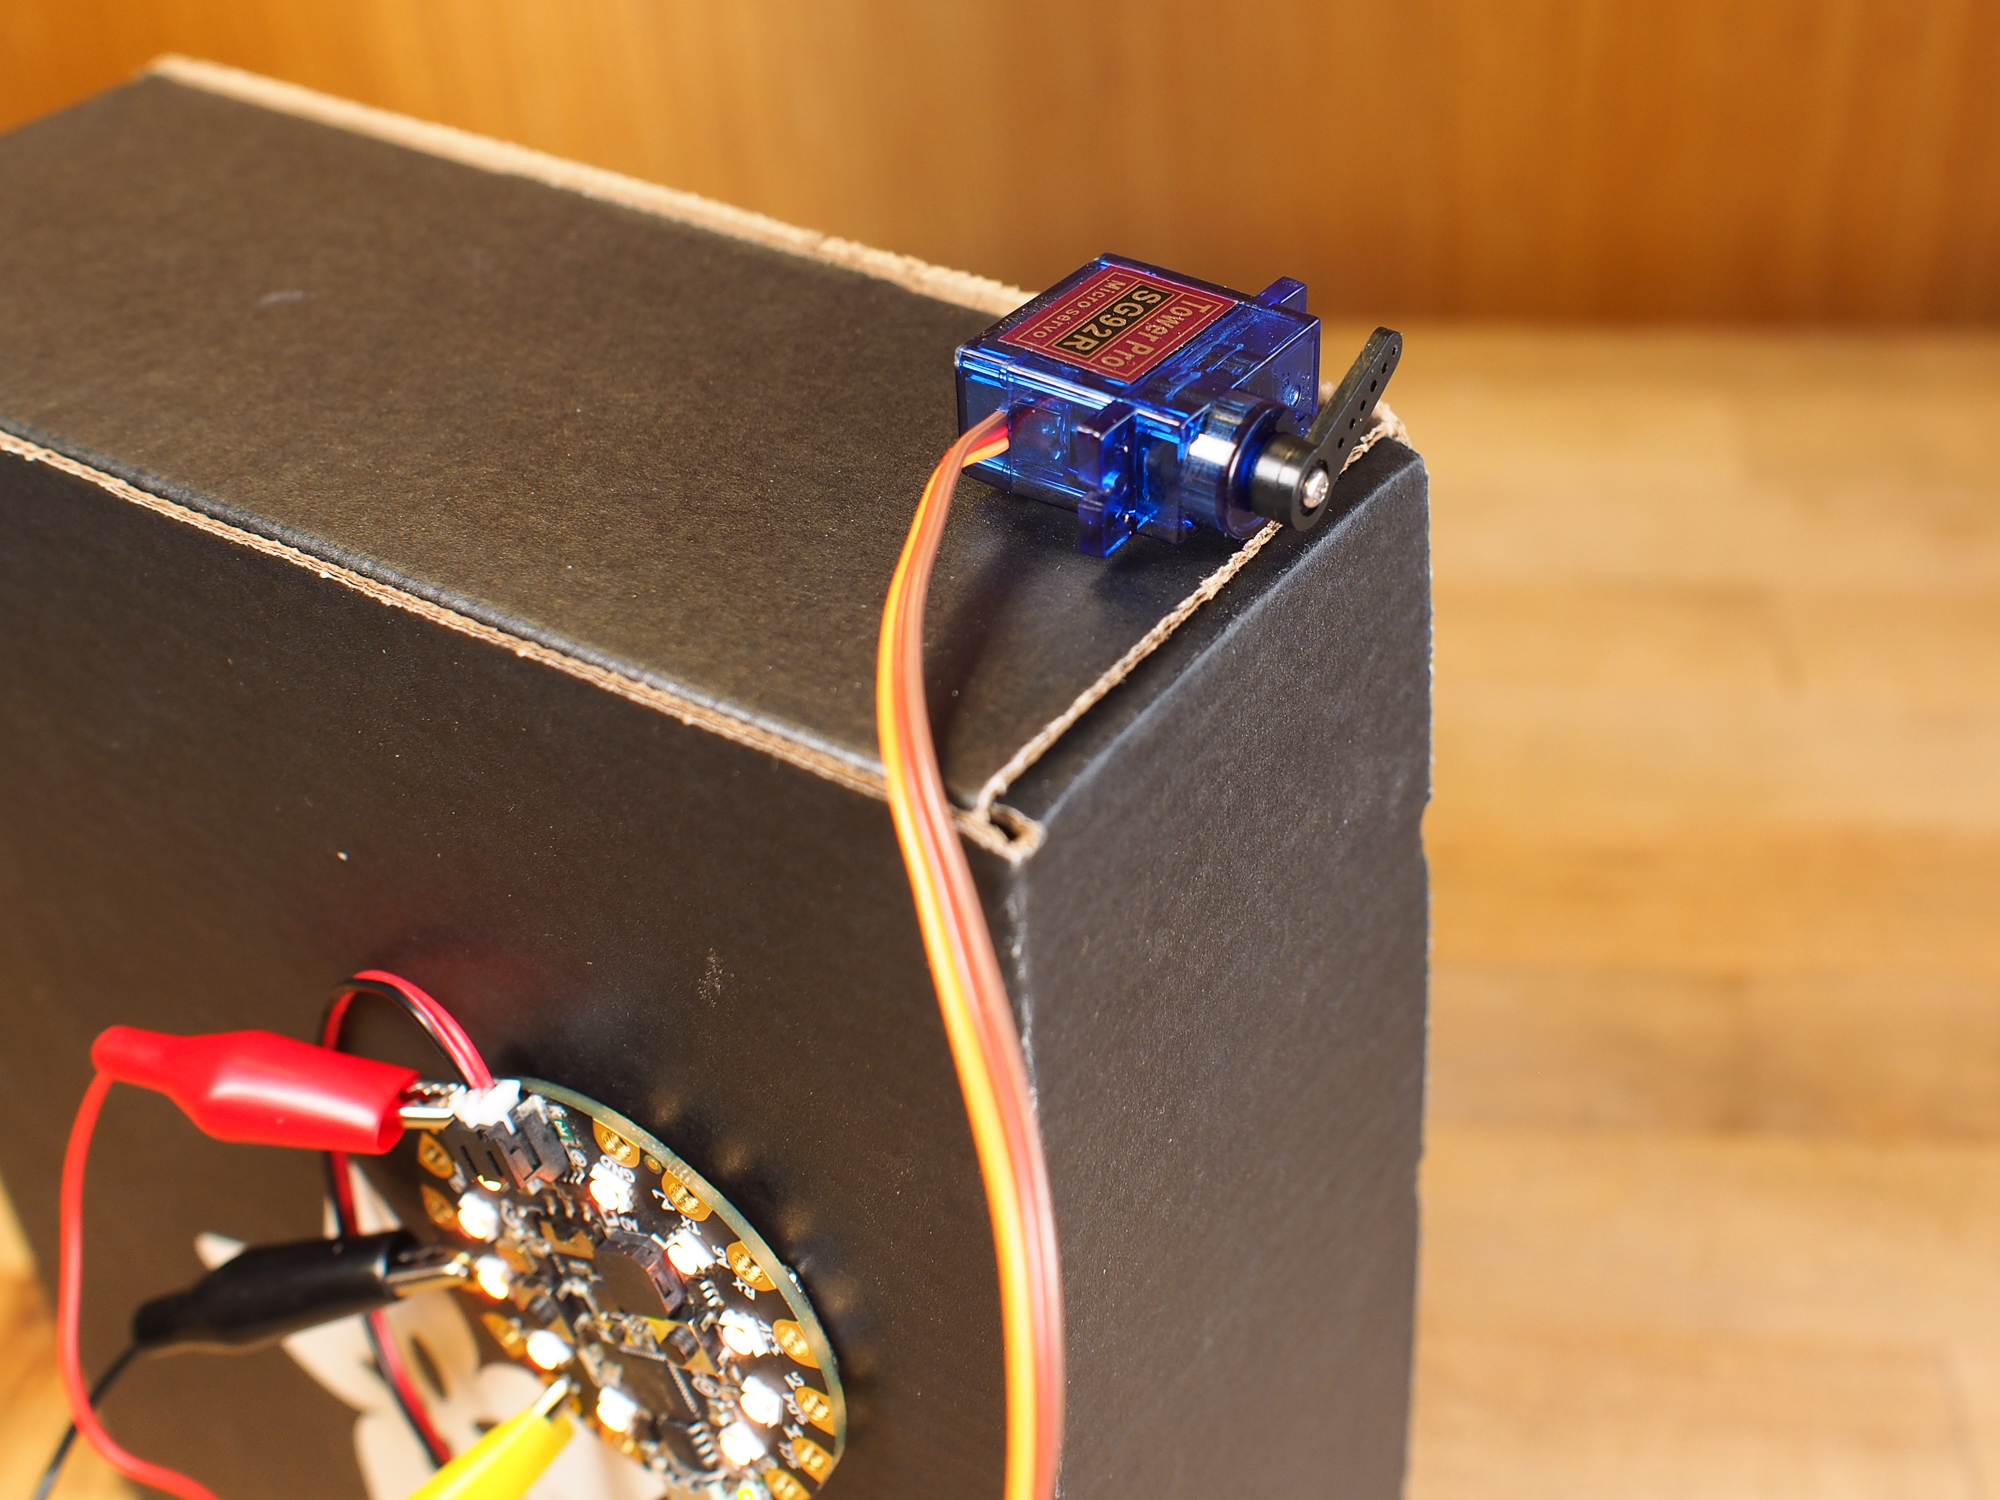 circuitpython_PC080509_2k.jpg